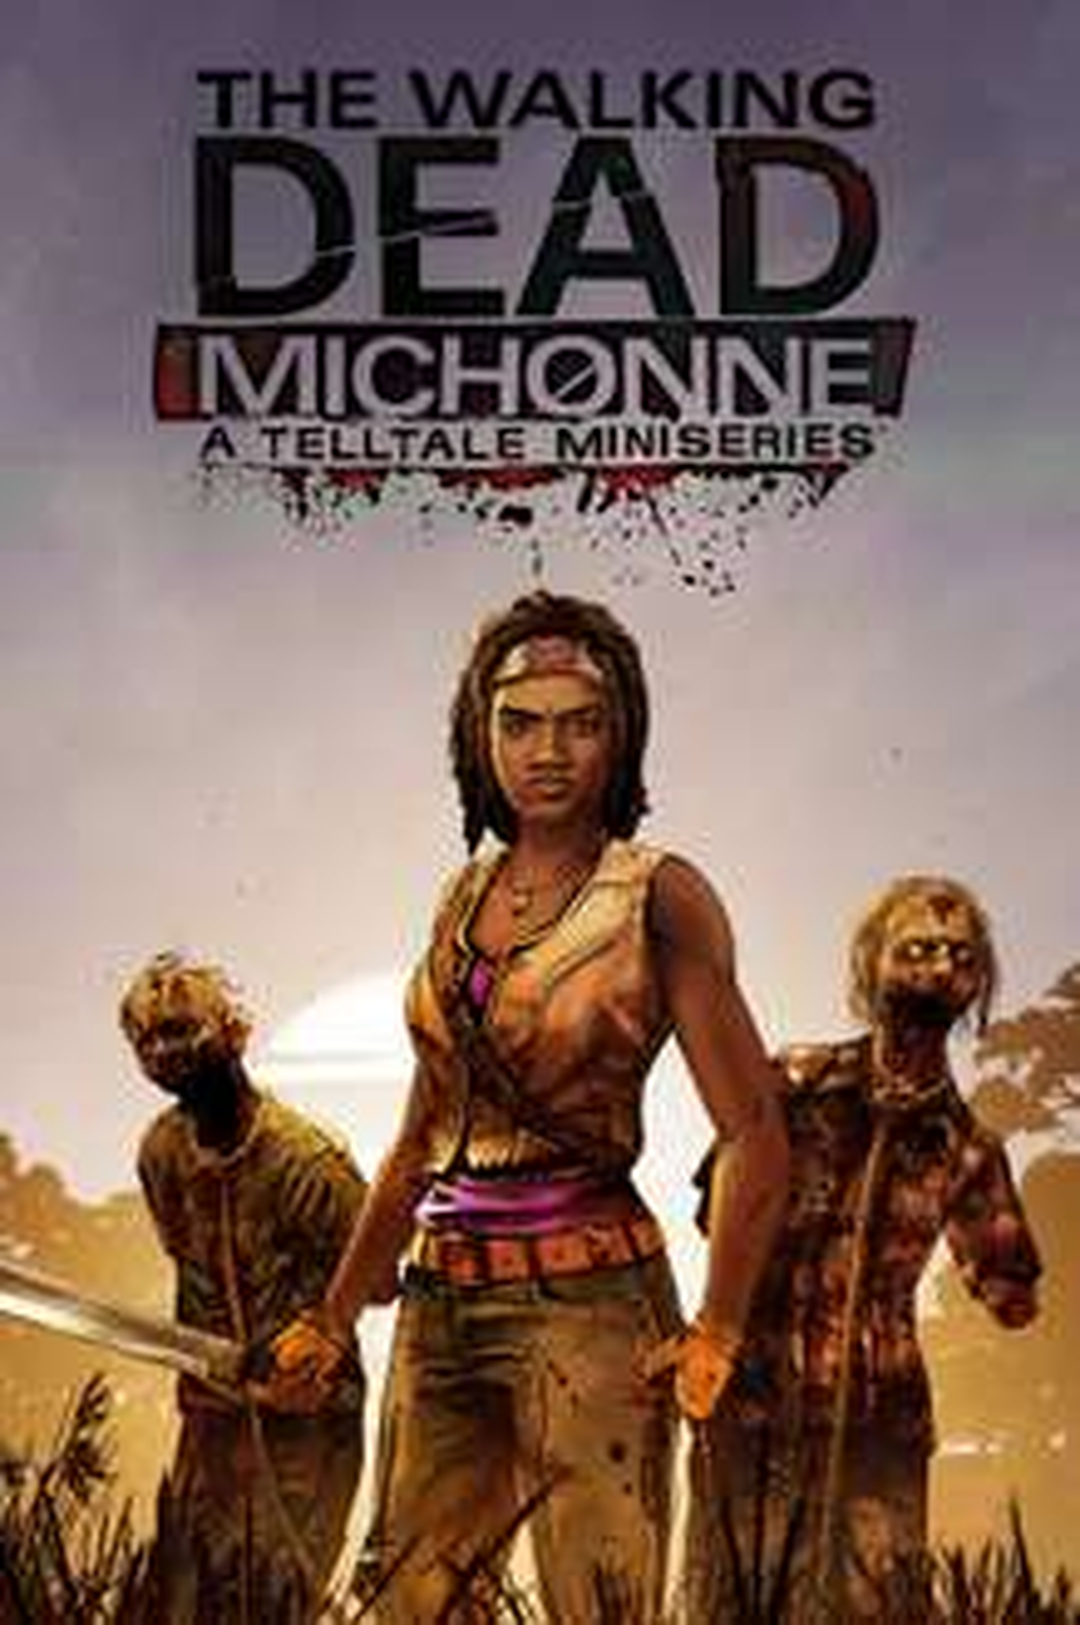 The Walking Dead: Michonne - A Telltale Miniseries [Steam- und Telltale Key] humblebundle